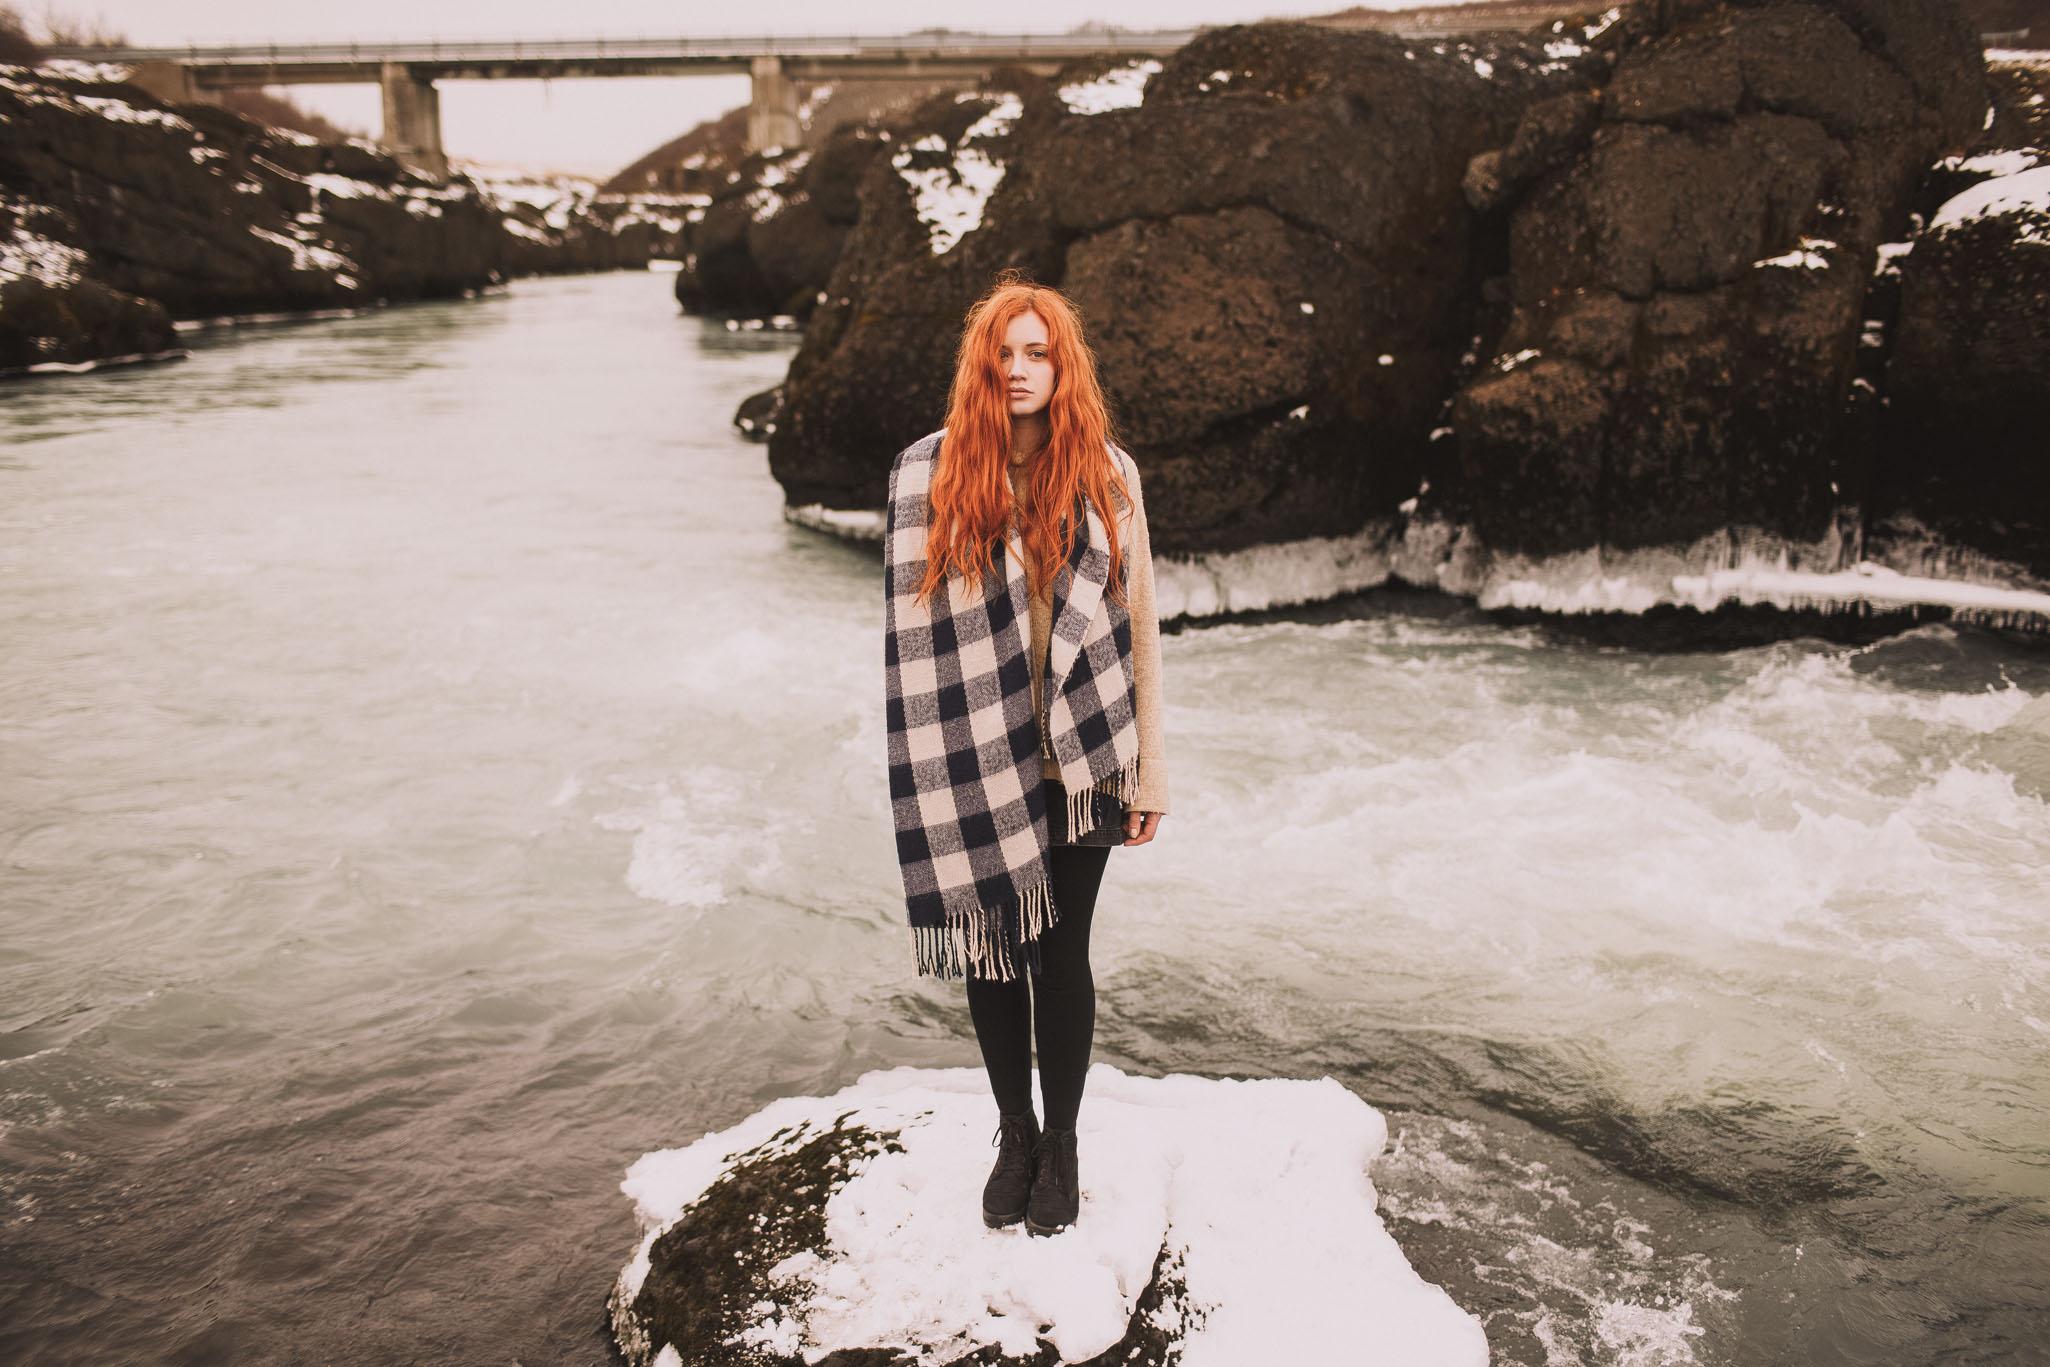 Road-trip-Islande-Iceland-Voyage-Travel-Portrait-Jérémy-Boyer-Geysir-Geysers-Horse-snow-ice-Gullfoss-24.jpg